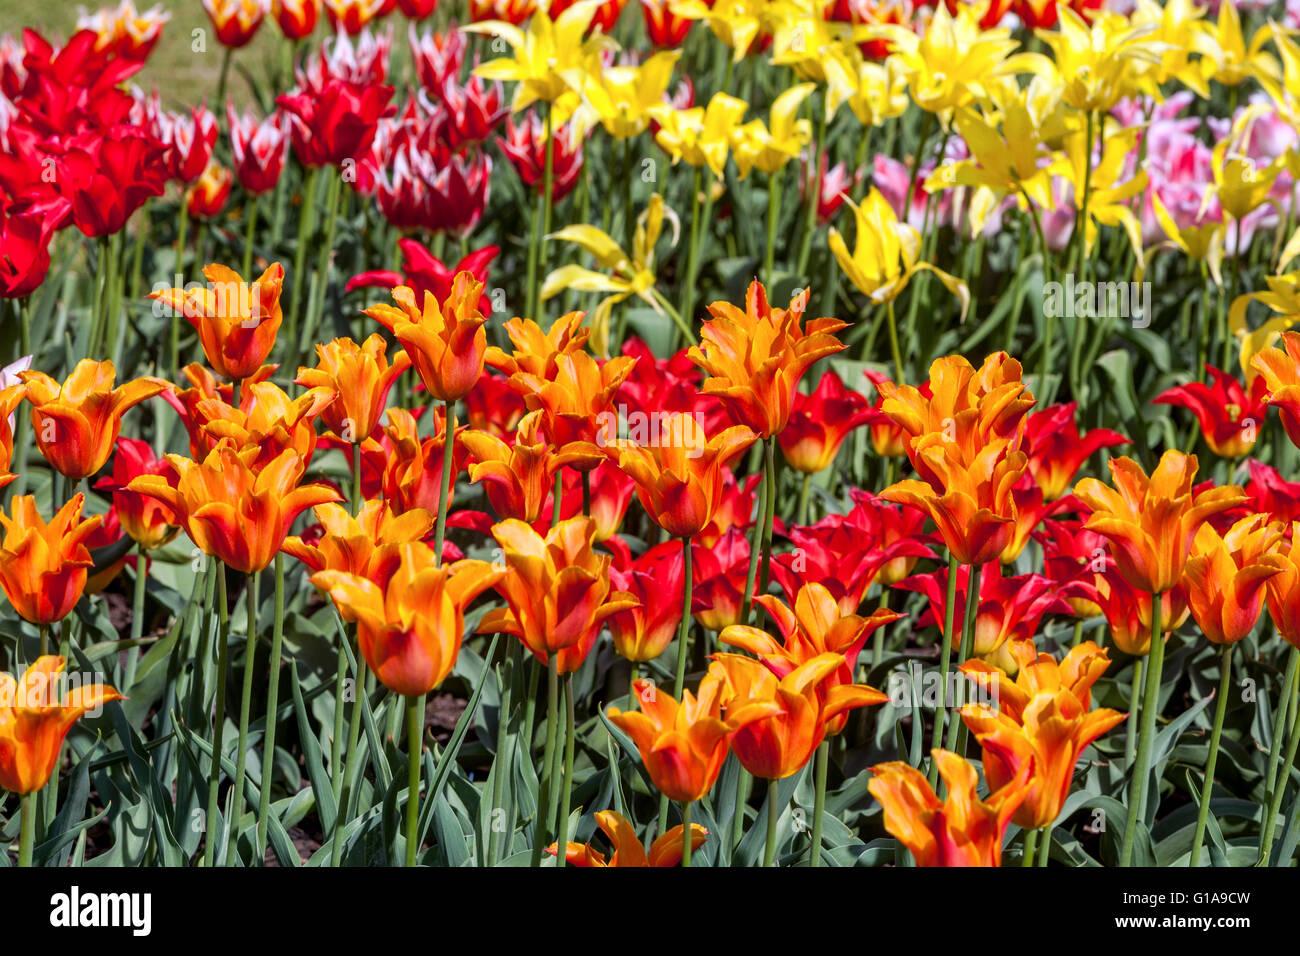 Flowering Tulips garden, Tulipa, - Stock Image